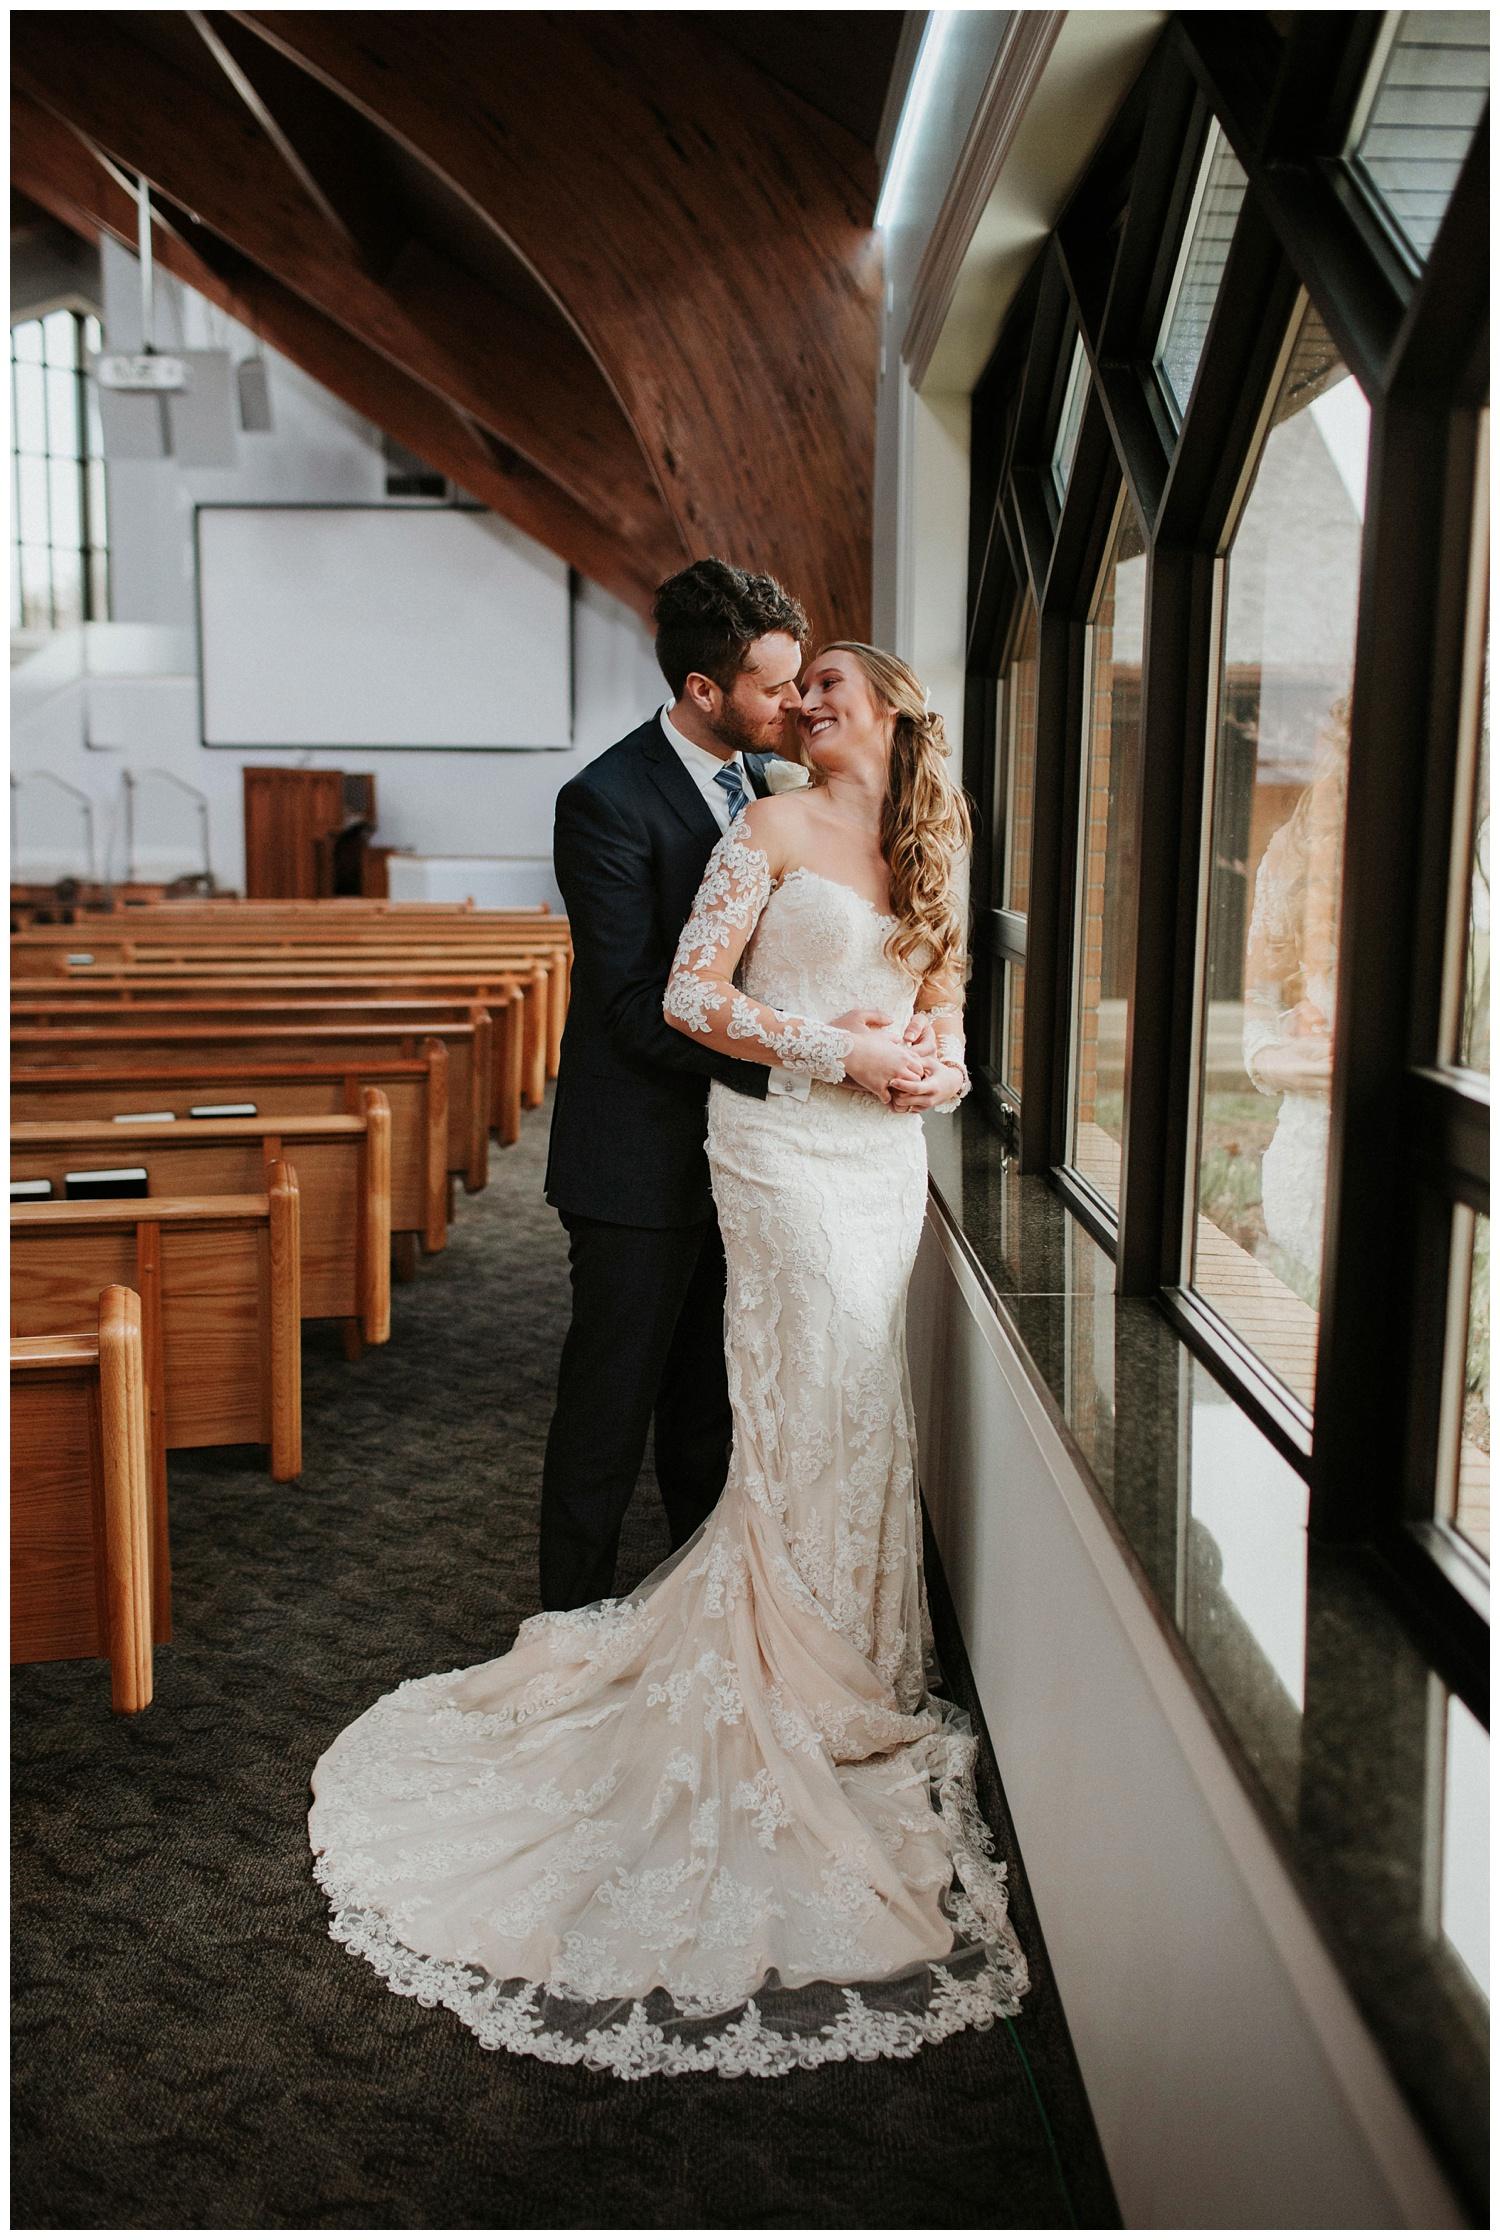 Shadowland Silver Beach St. Joseph Wedding Photographer Rainy Wedding27.jpg